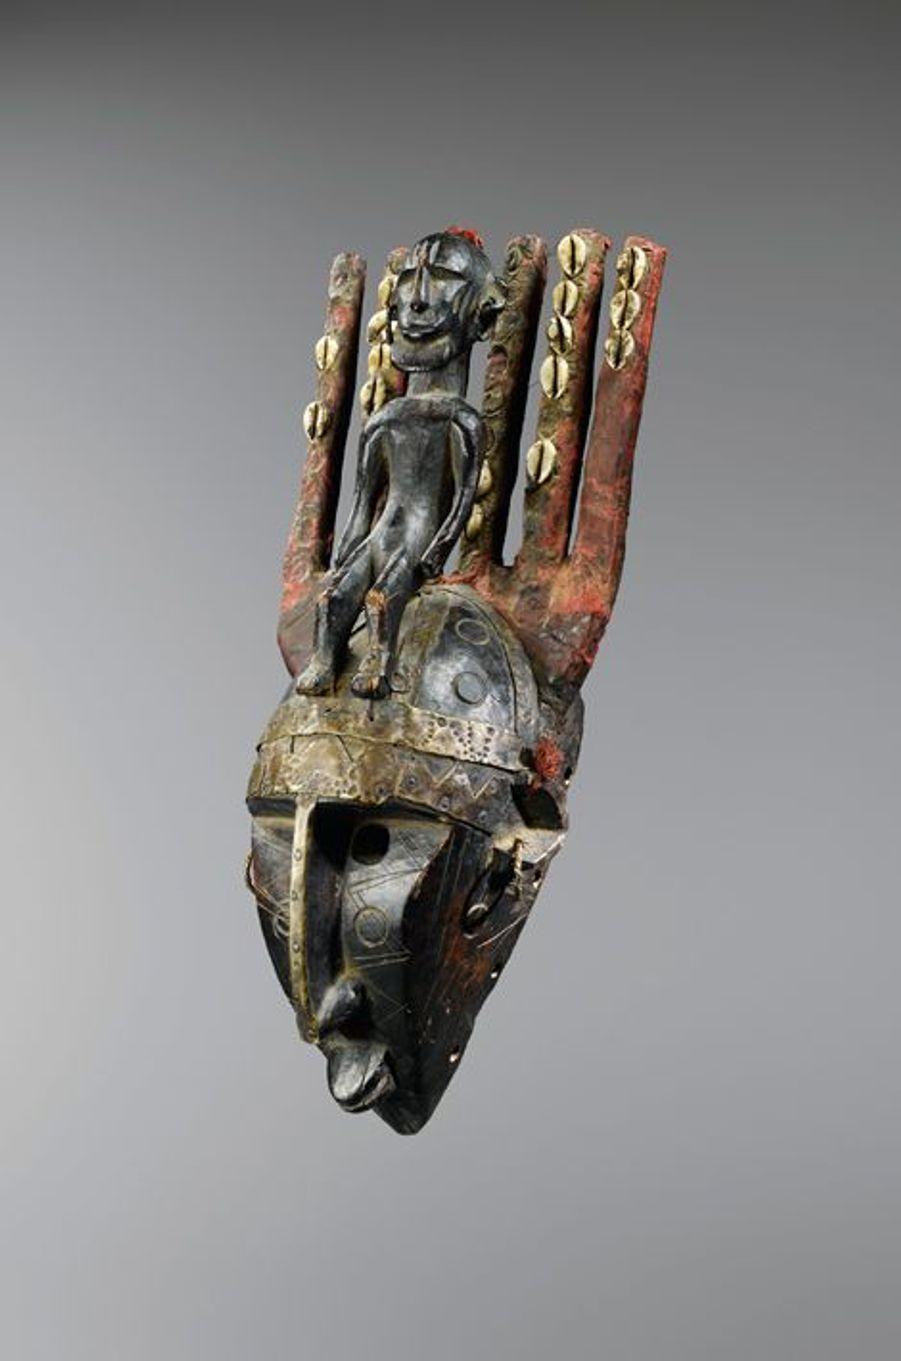 Masque ntomo - Bamana / Marka (Mali)